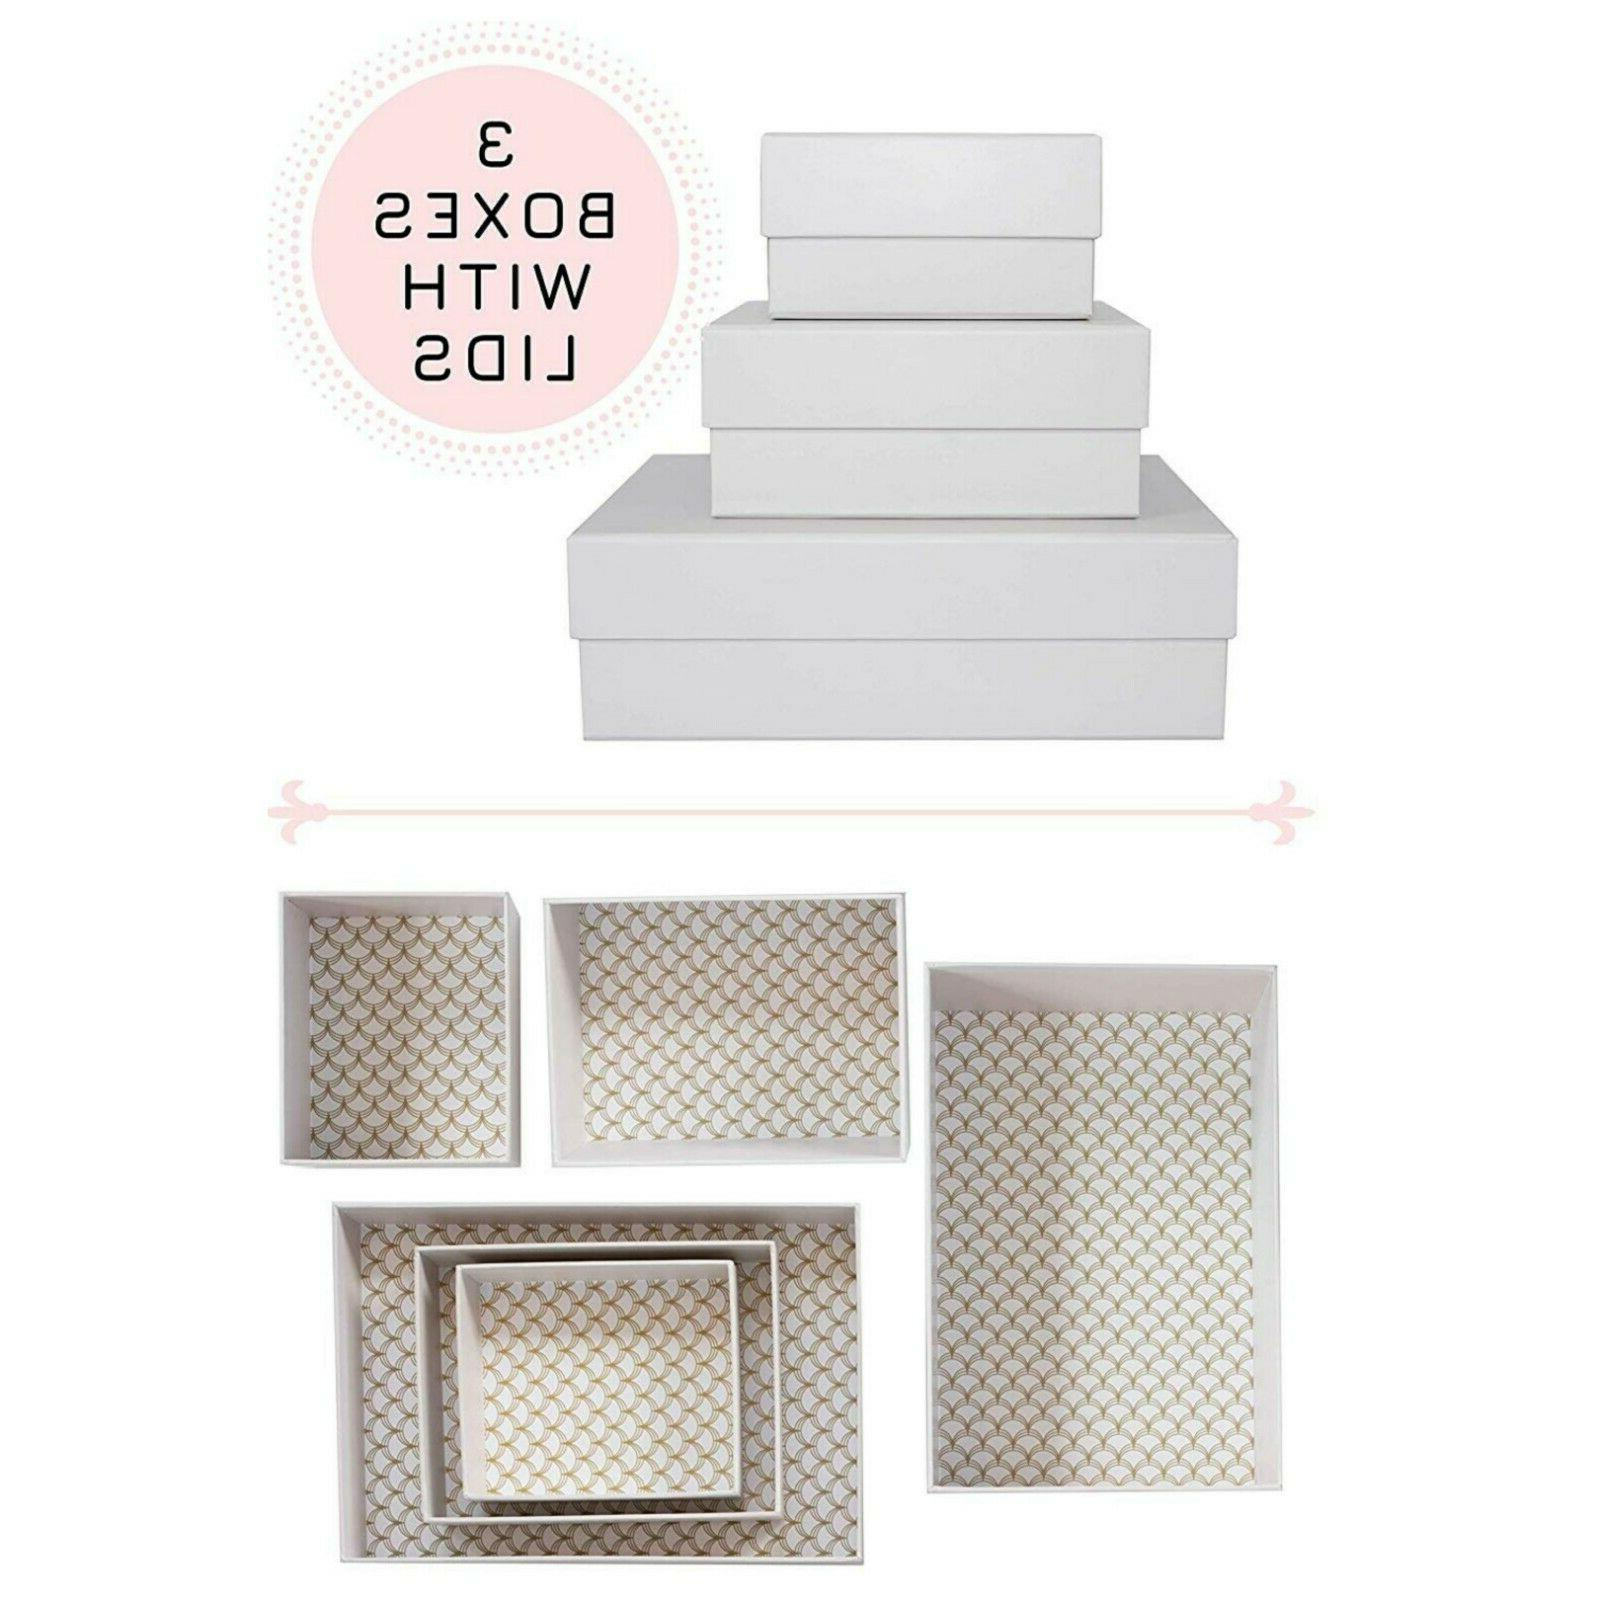 hikidashi box set of 3 marie kondo